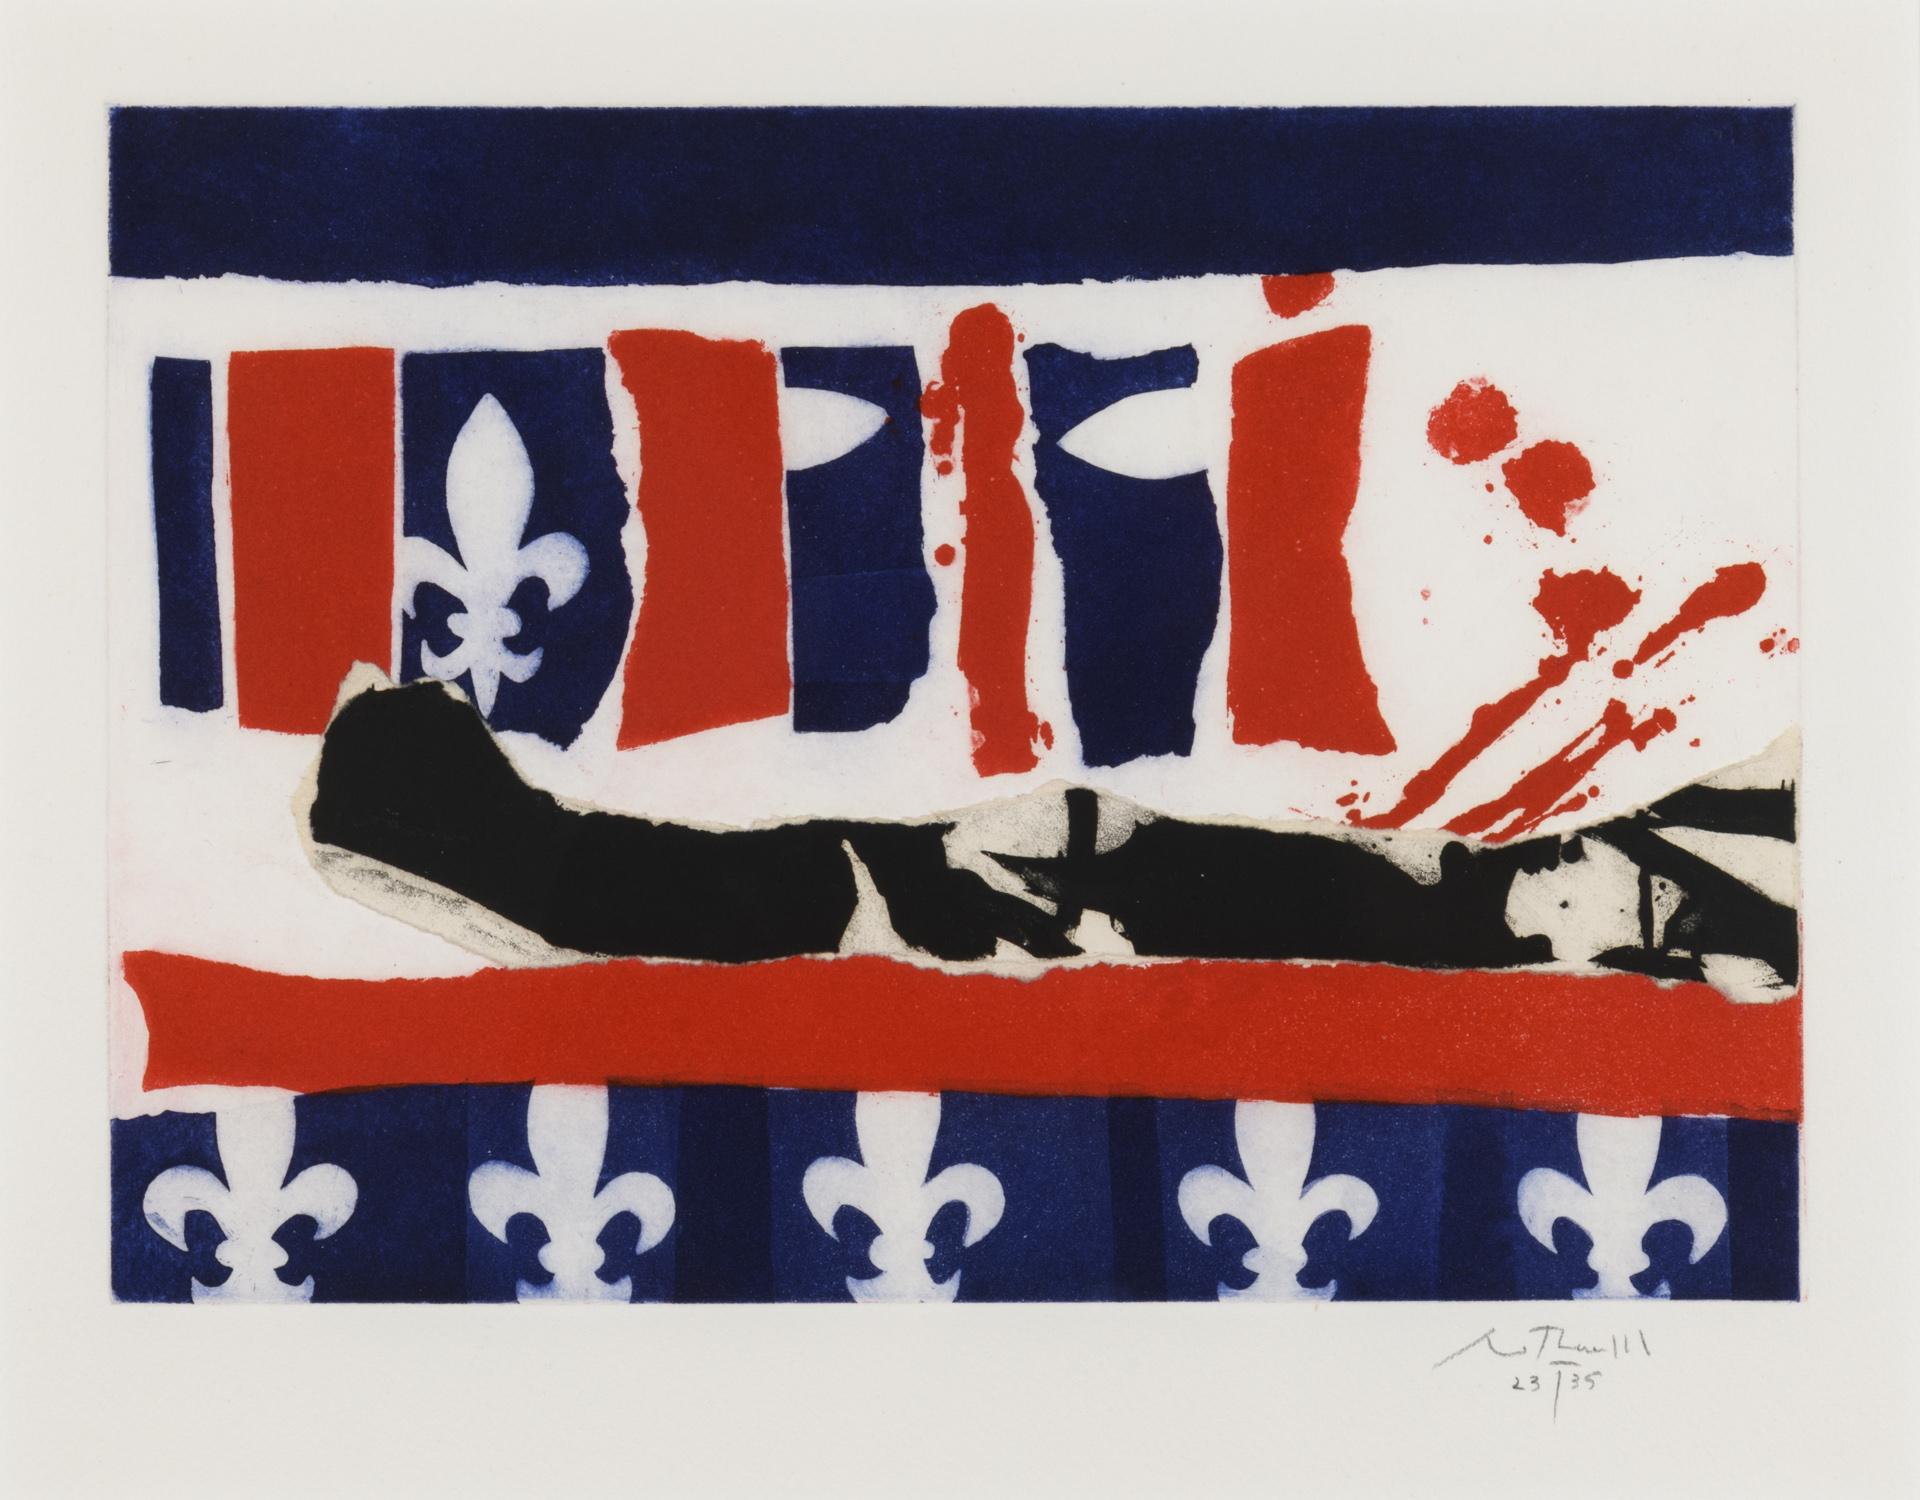 French Revolution Bicentennial II by Robert Motherwell